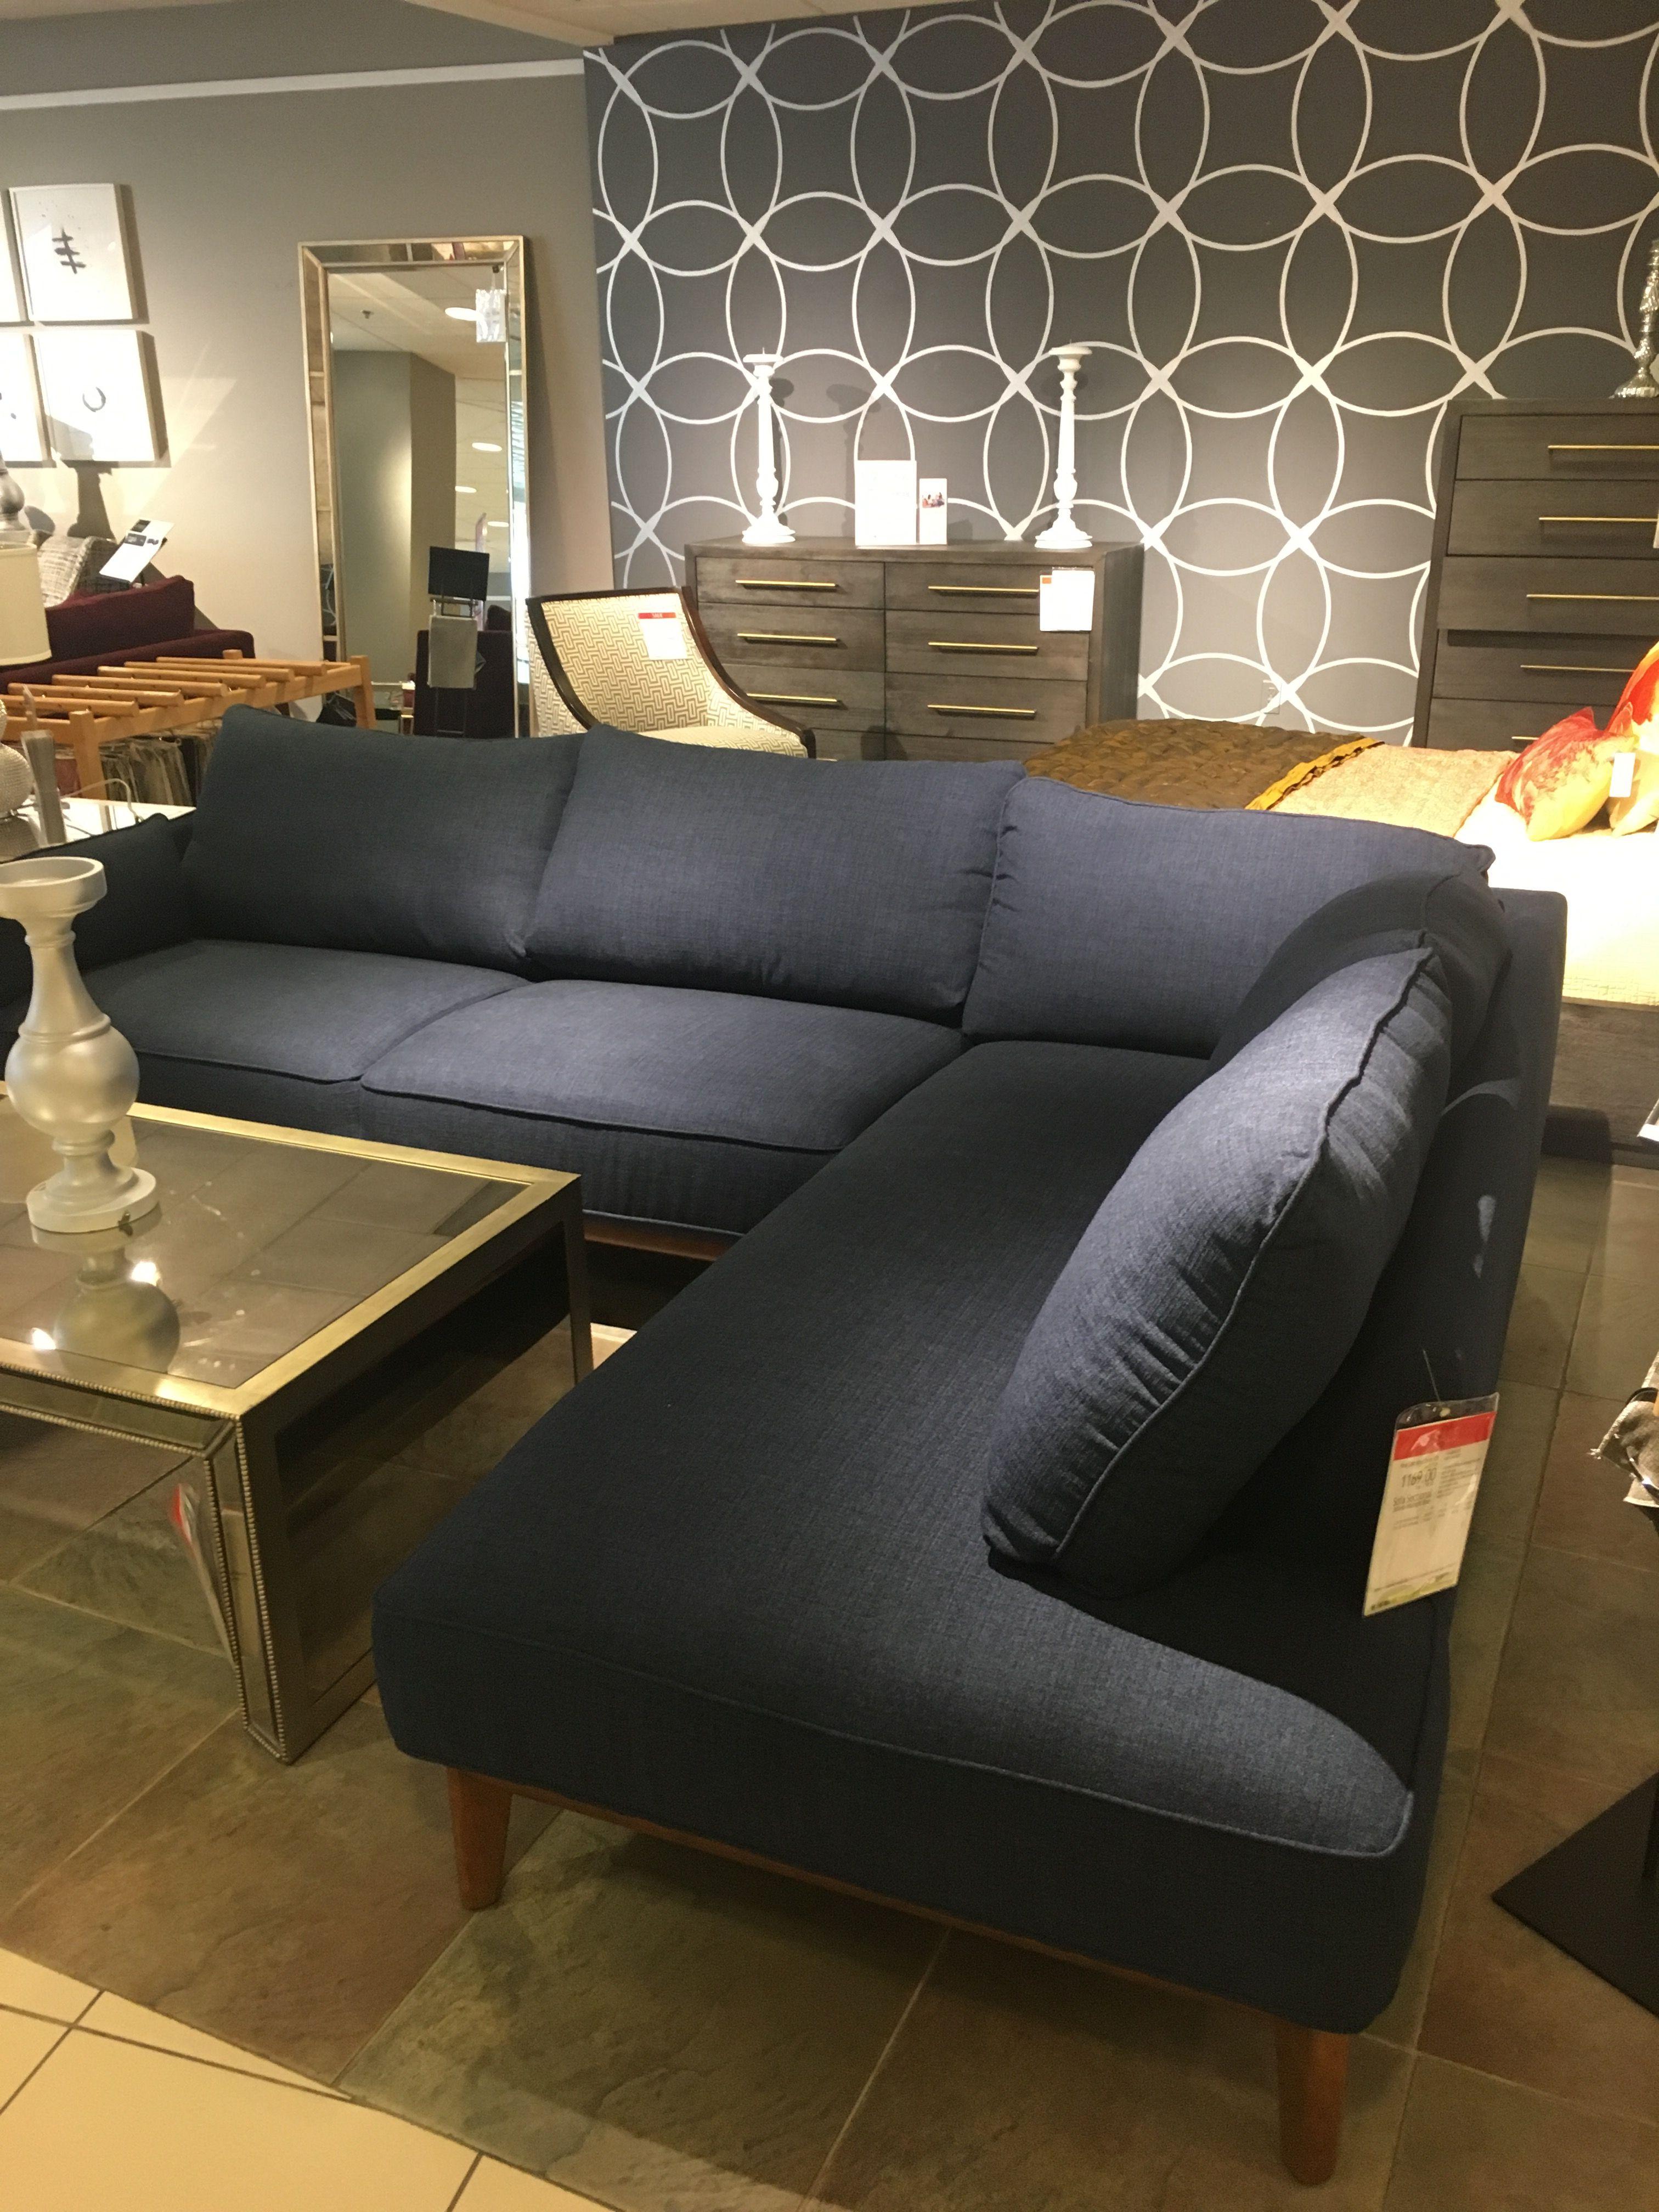 Macys jollene on sale 1169 living room home decor